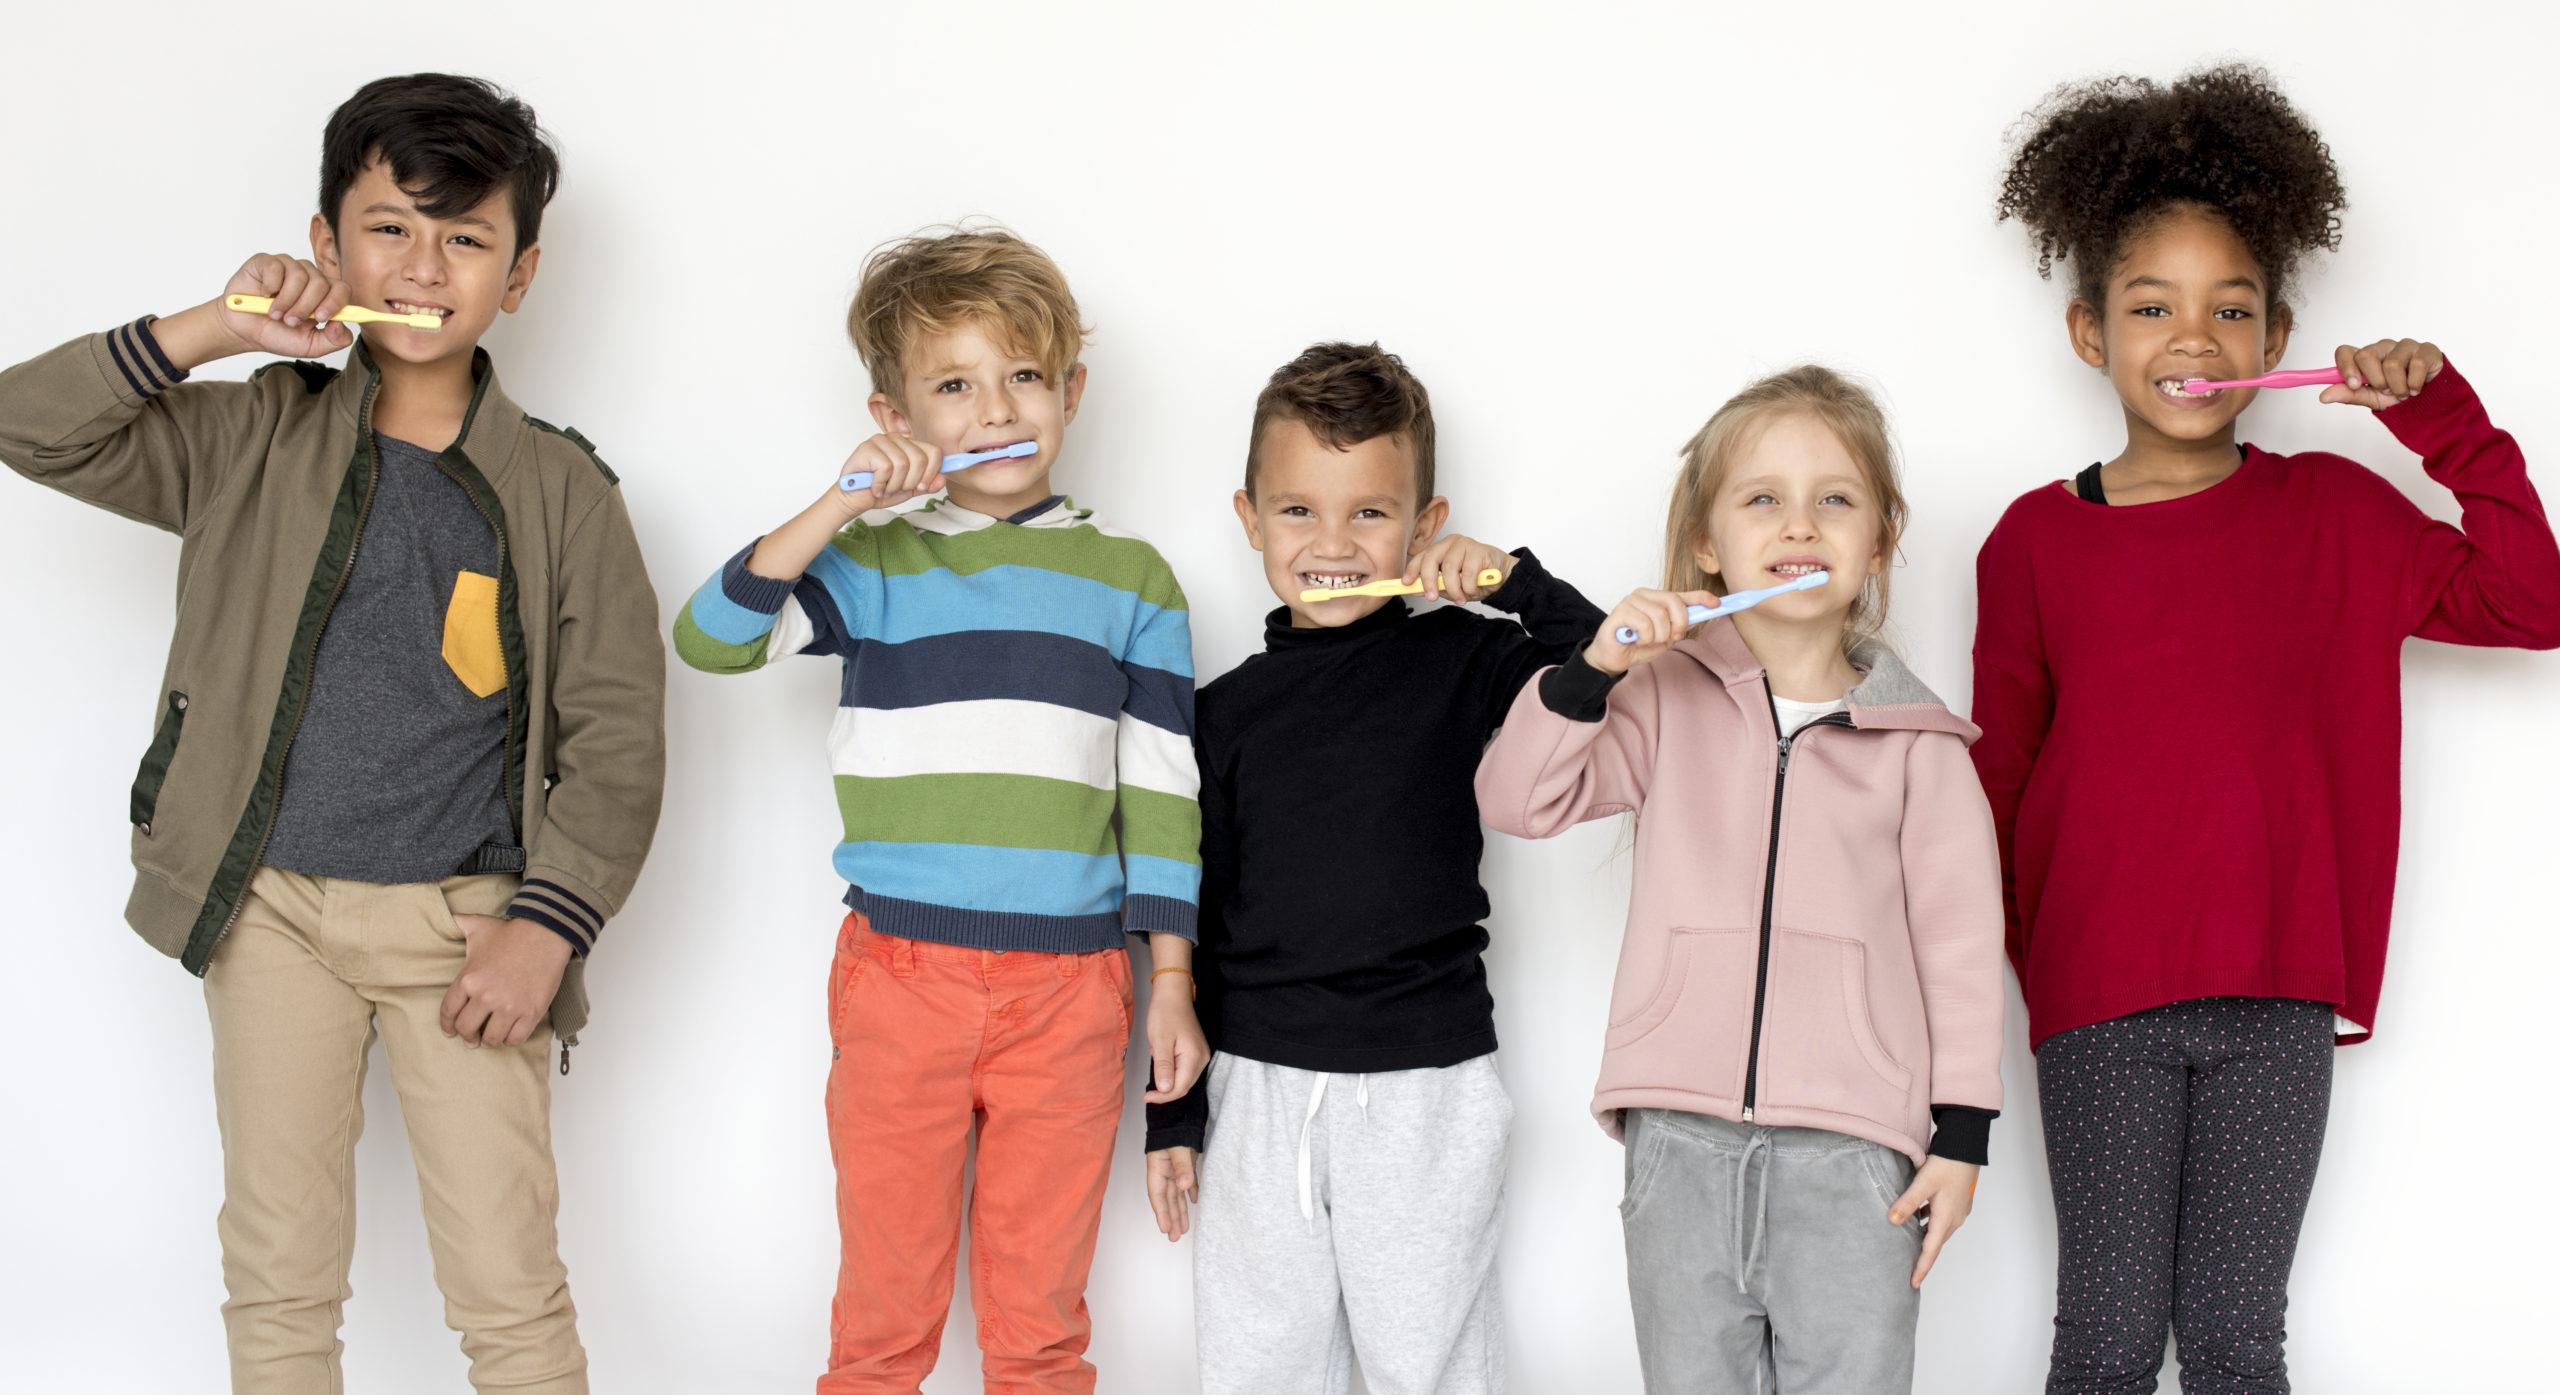 kids brushing their teeth to avoid dental problems